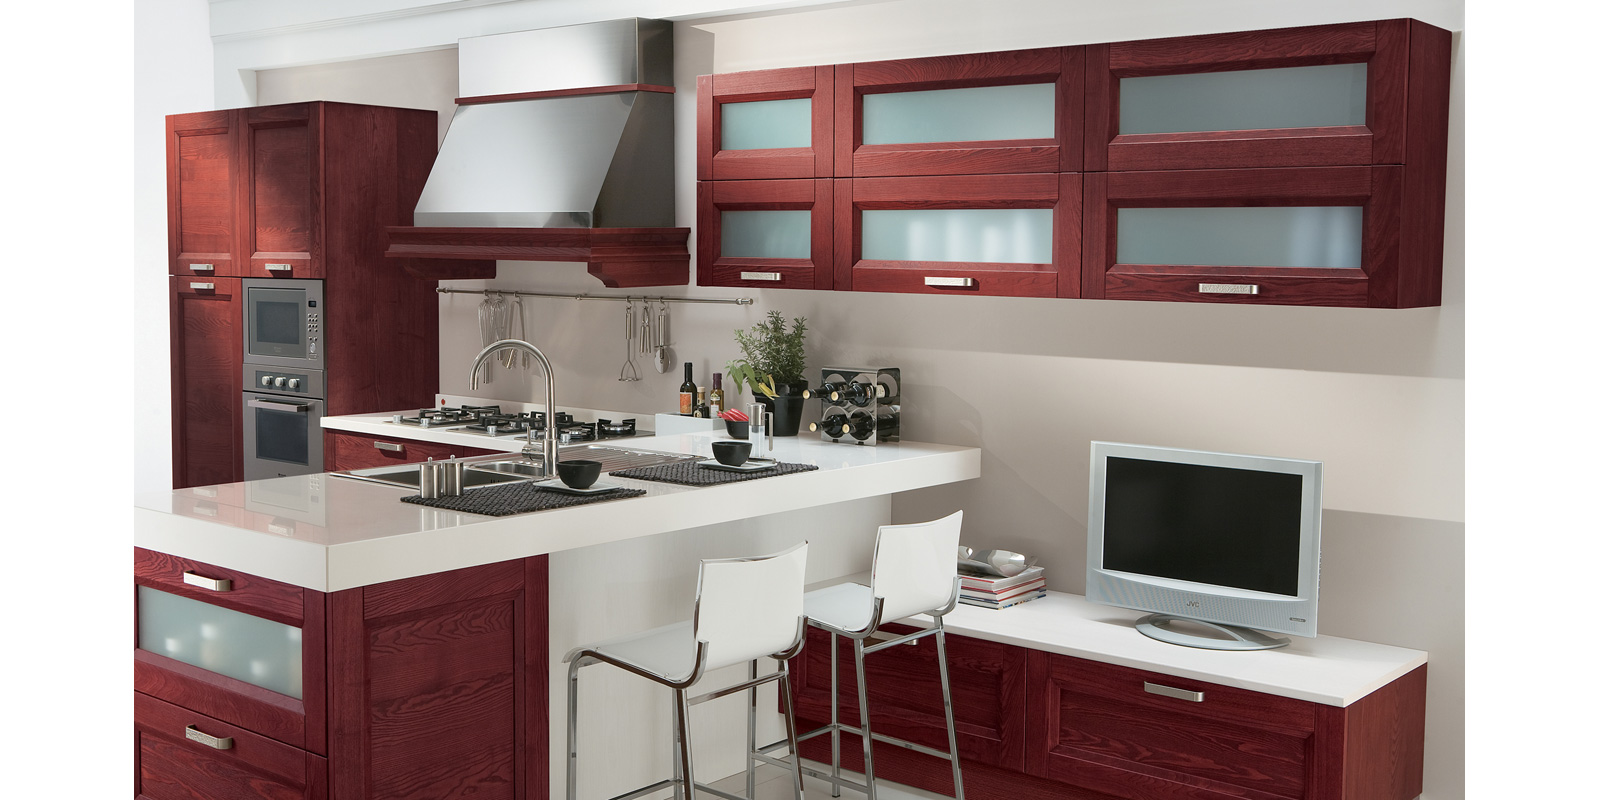 Cucine Arte Povera Mondo Convenienza: Cucina Arte Povera Mondo  #91433A 1600 800 Planner Cucina Mondo Convenienza